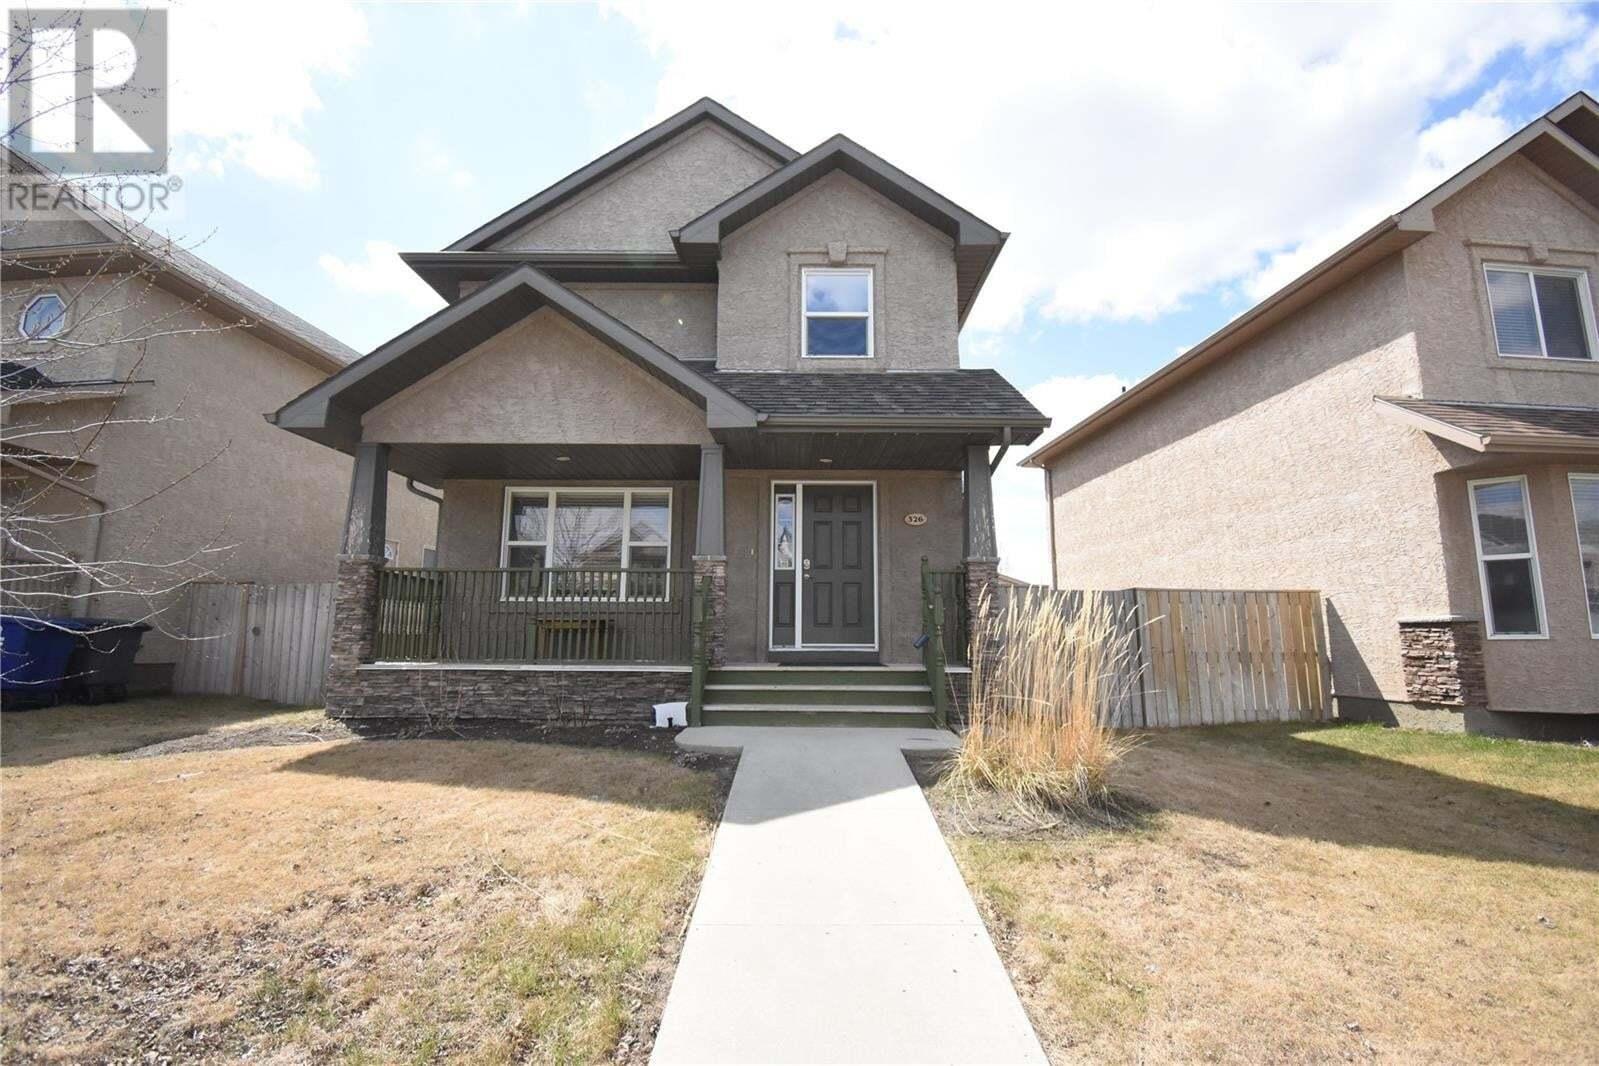 House for sale at 326 Gordon Rd Saskatoon Saskatchewan - MLS: SK808351